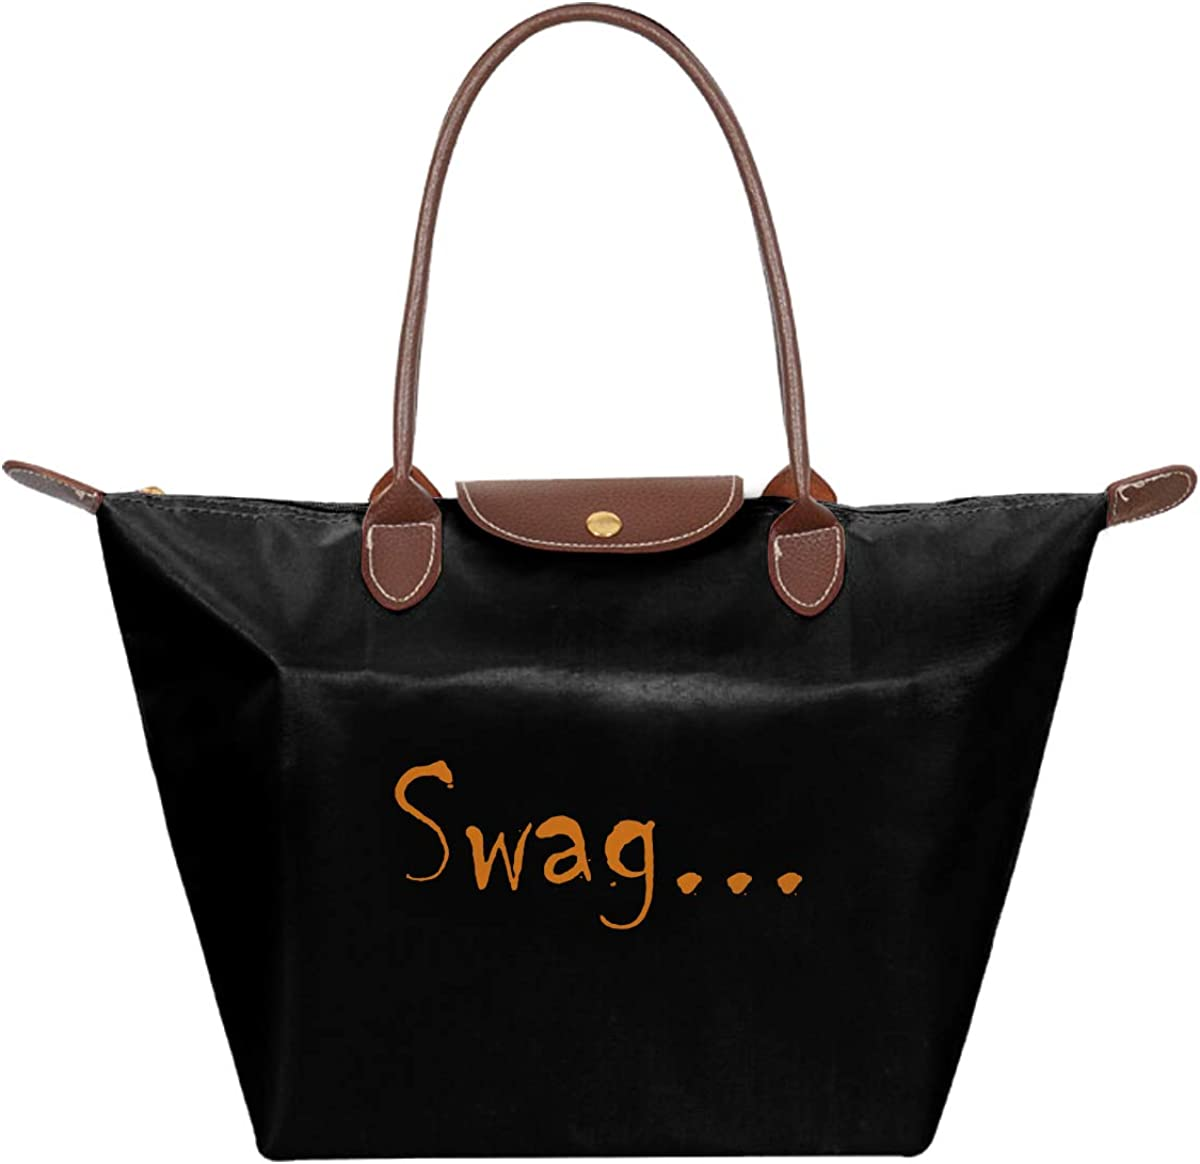 Swag PU Folding Dumpling Bag Tote Bag Large Women Casual Shoulder Bag Handbag